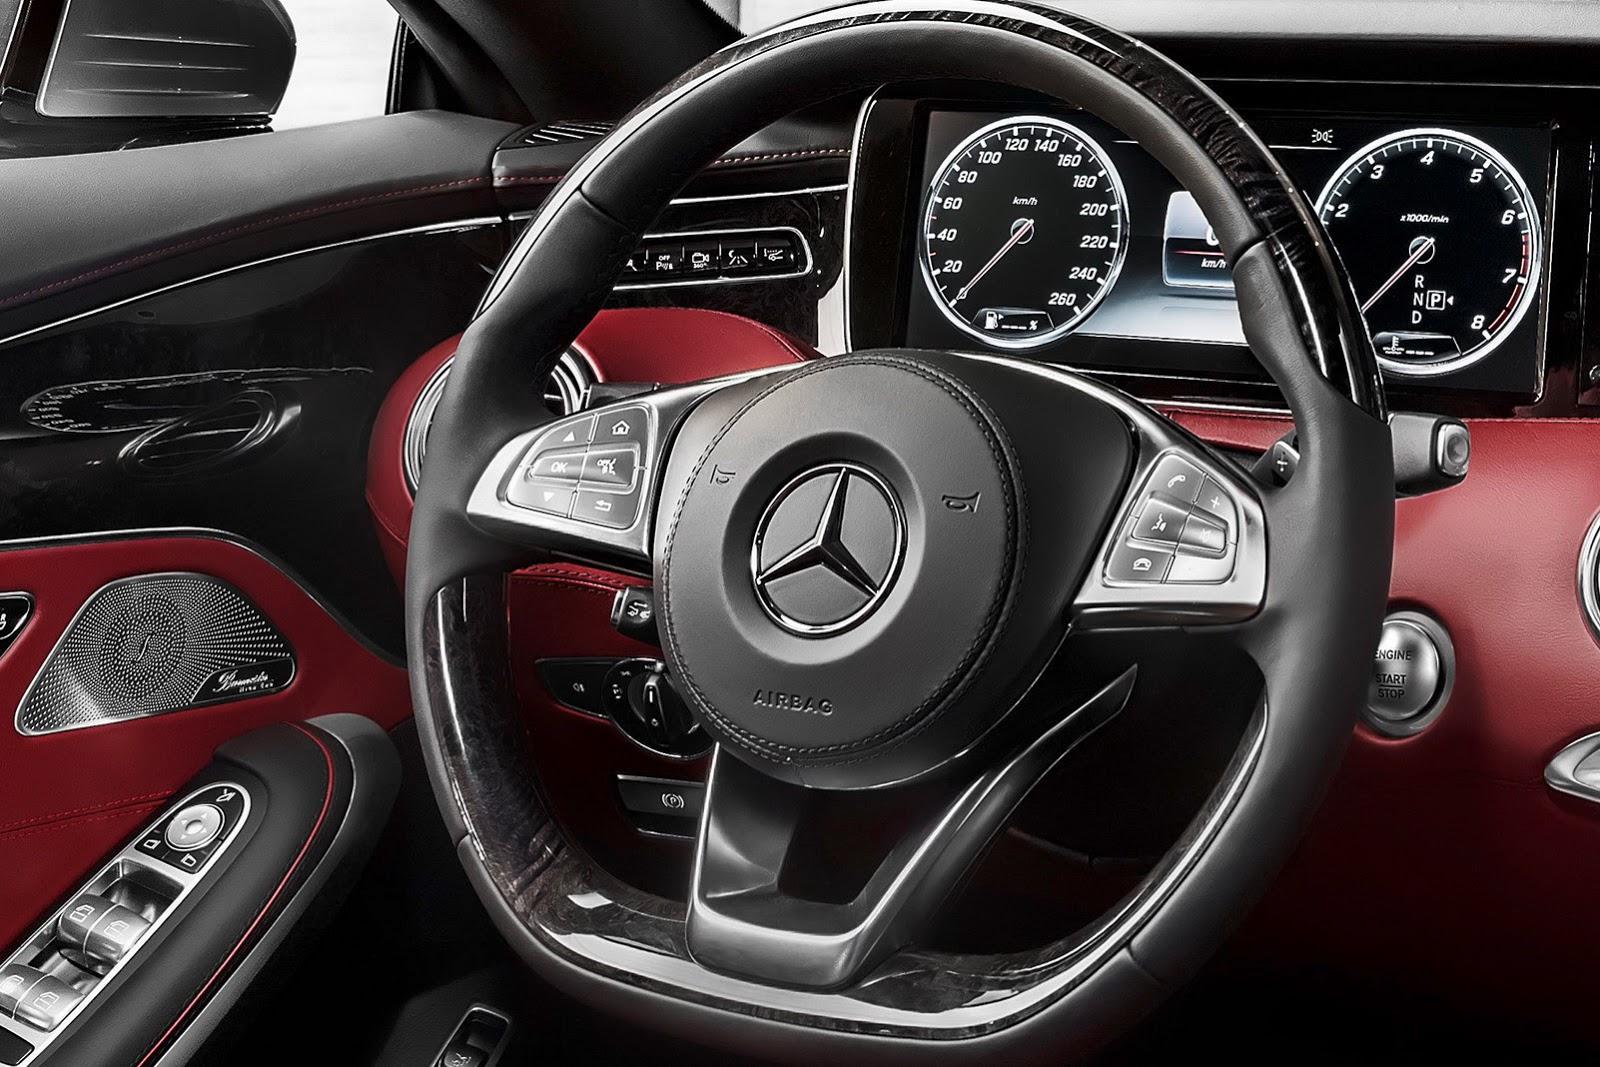 Mercedes-Benz S-class Coupe steering wheel